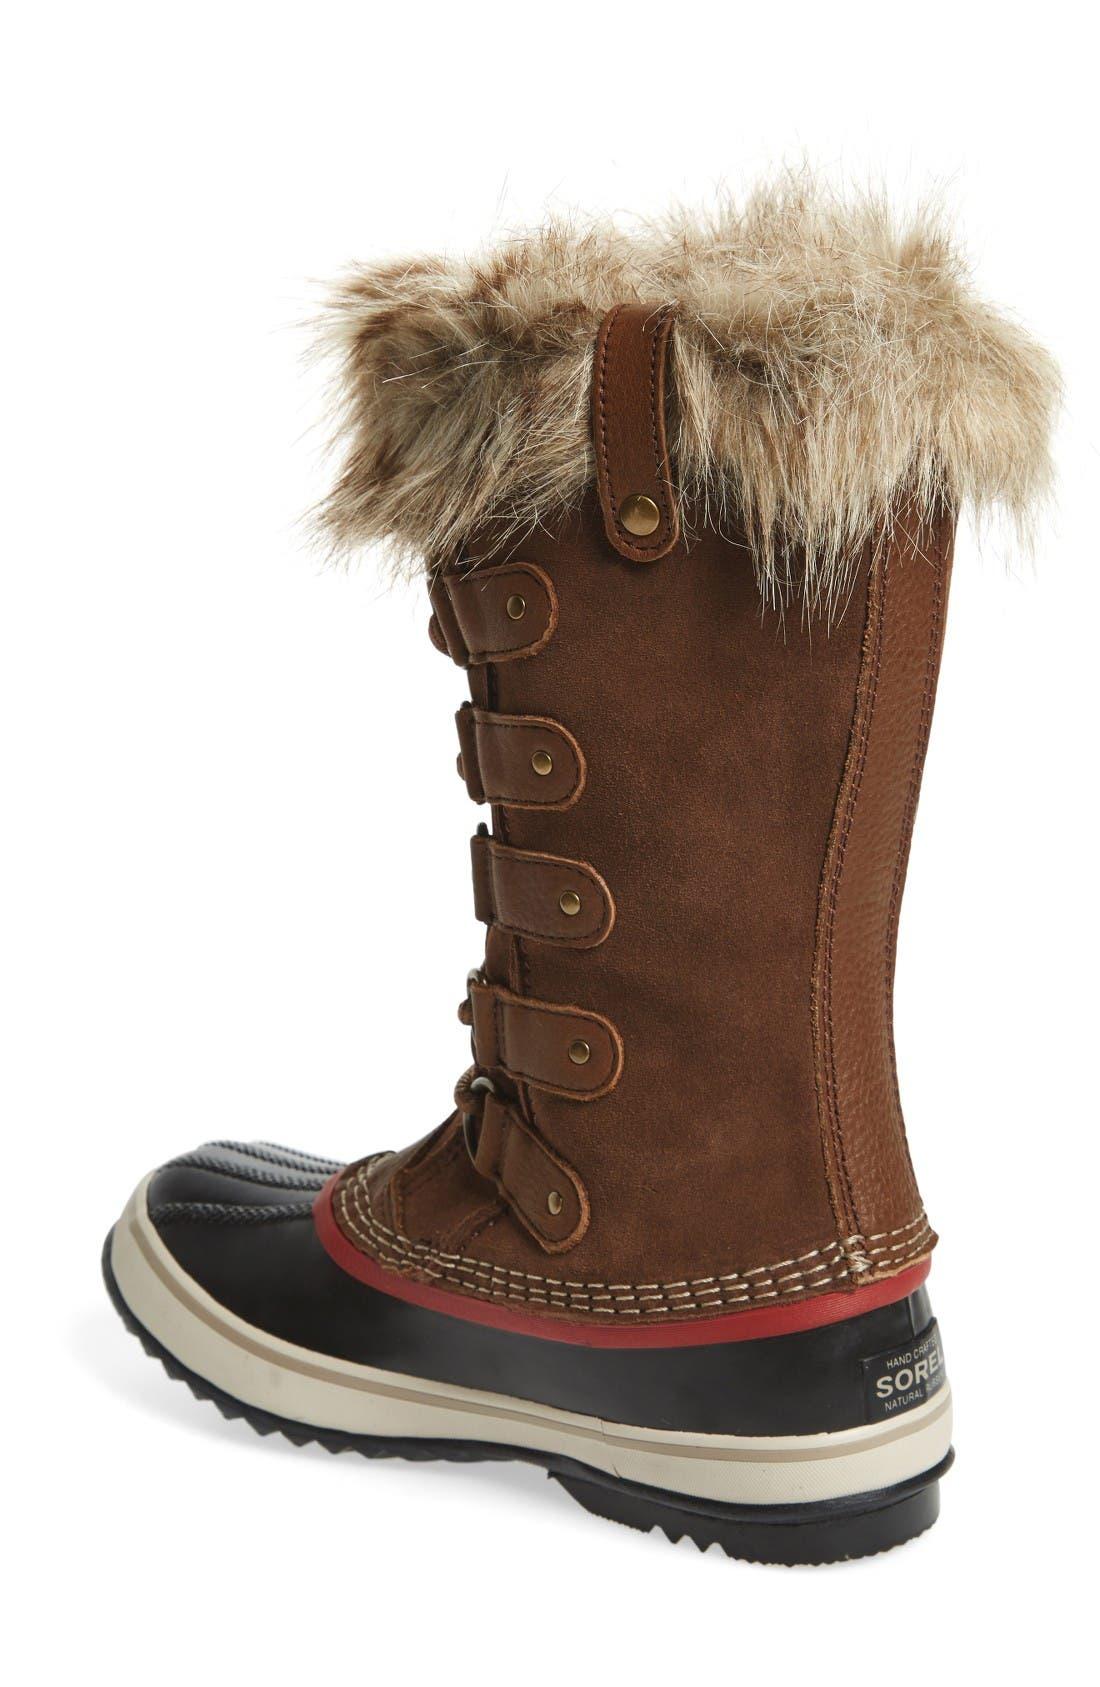 Alternate Image 2  - SOREL 'Joan of Arctic' Waterproof Snow Boot